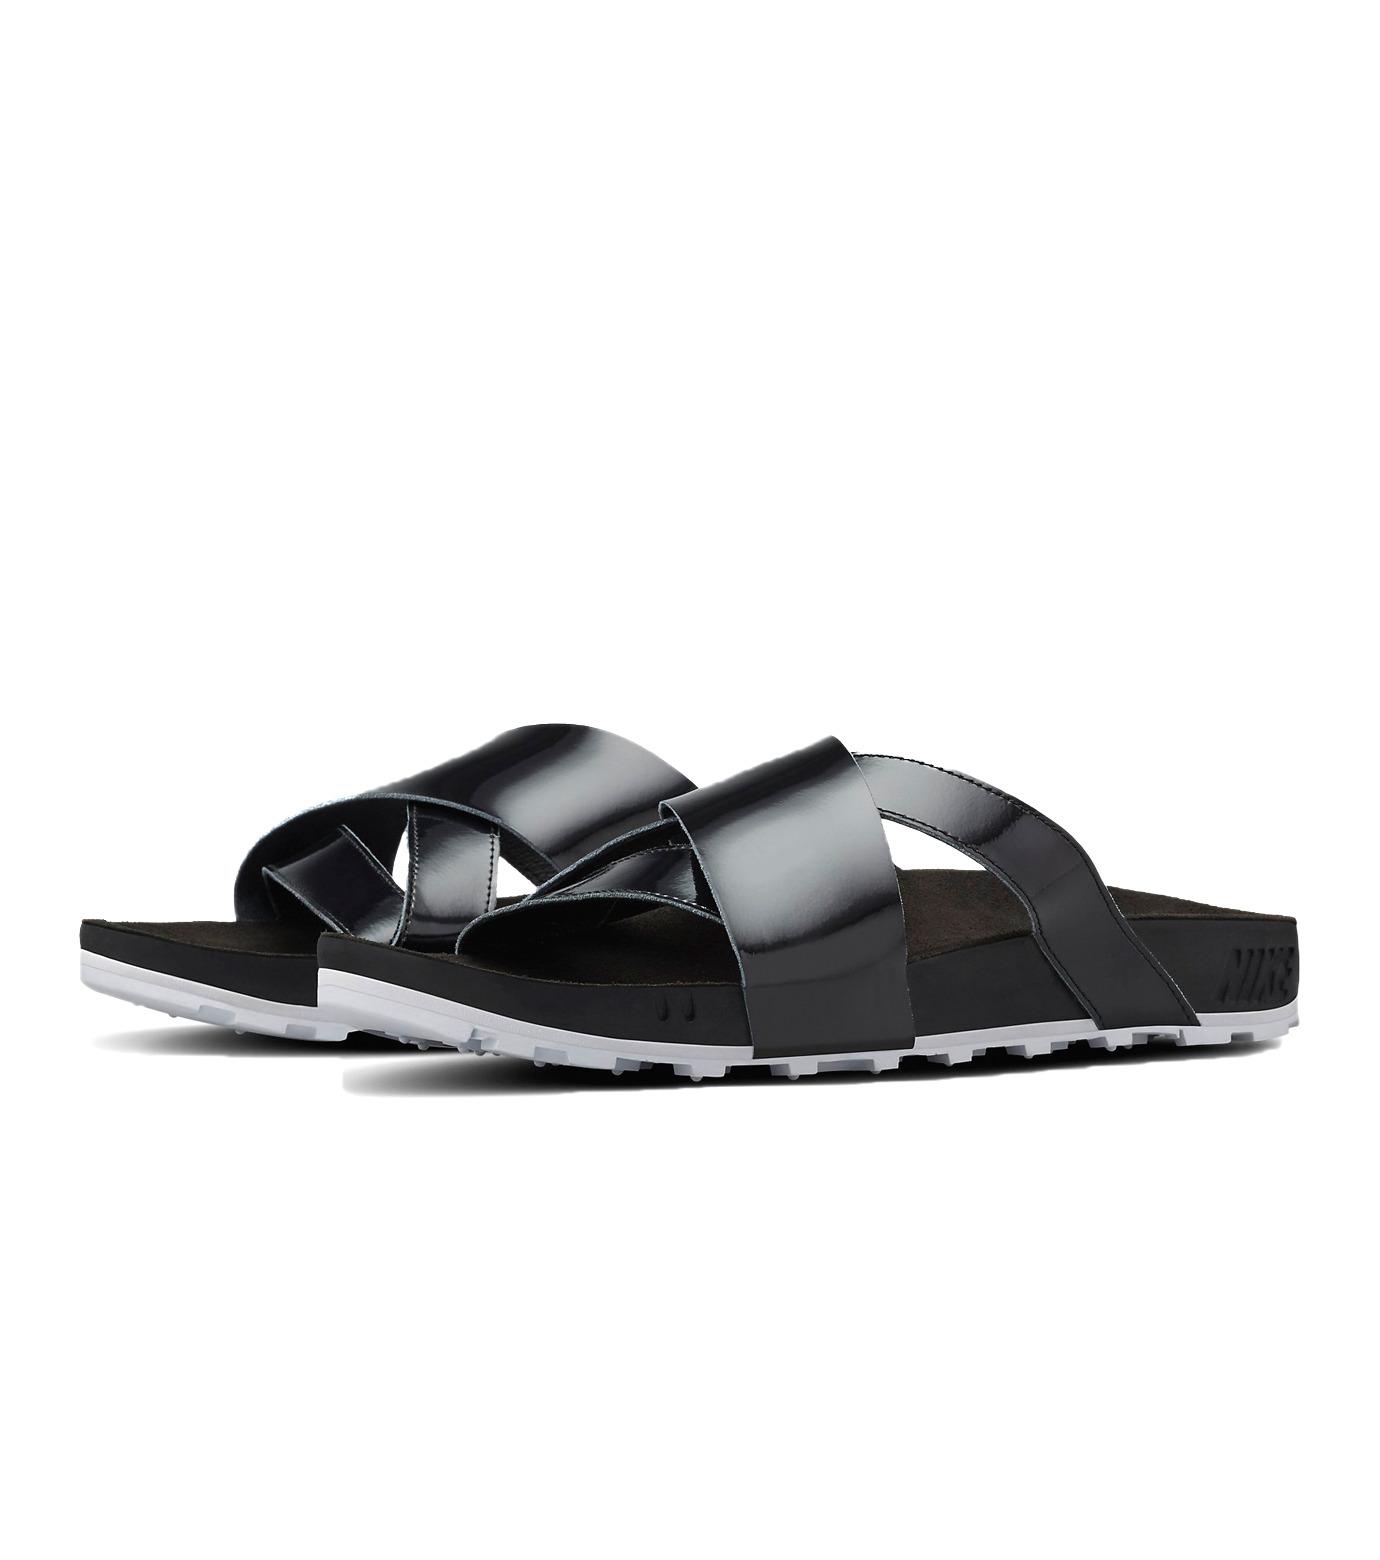 NIKE(ナイキ)のTaupo-BLACK(シューズ/shoes)-849756-001-13 拡大詳細画像3